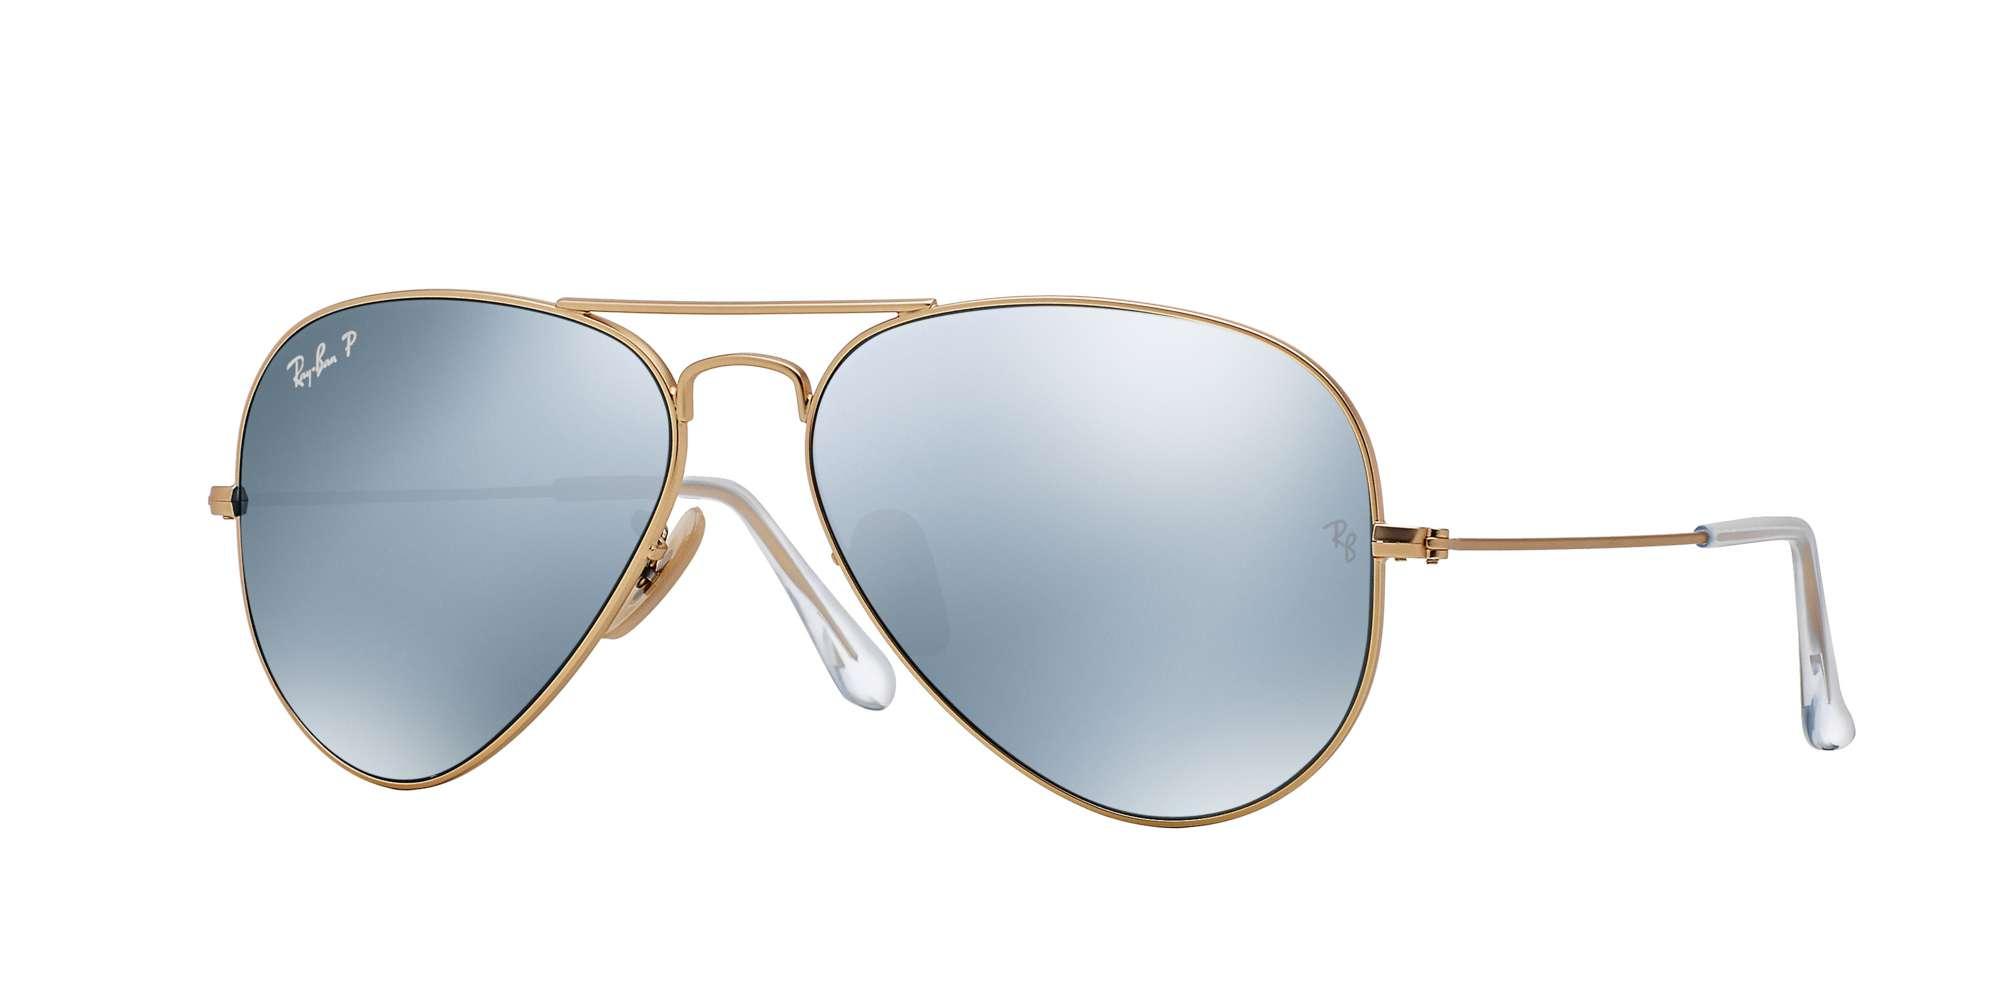 MATTE GOLD / DARK GREY MIRROR POLAR lenses